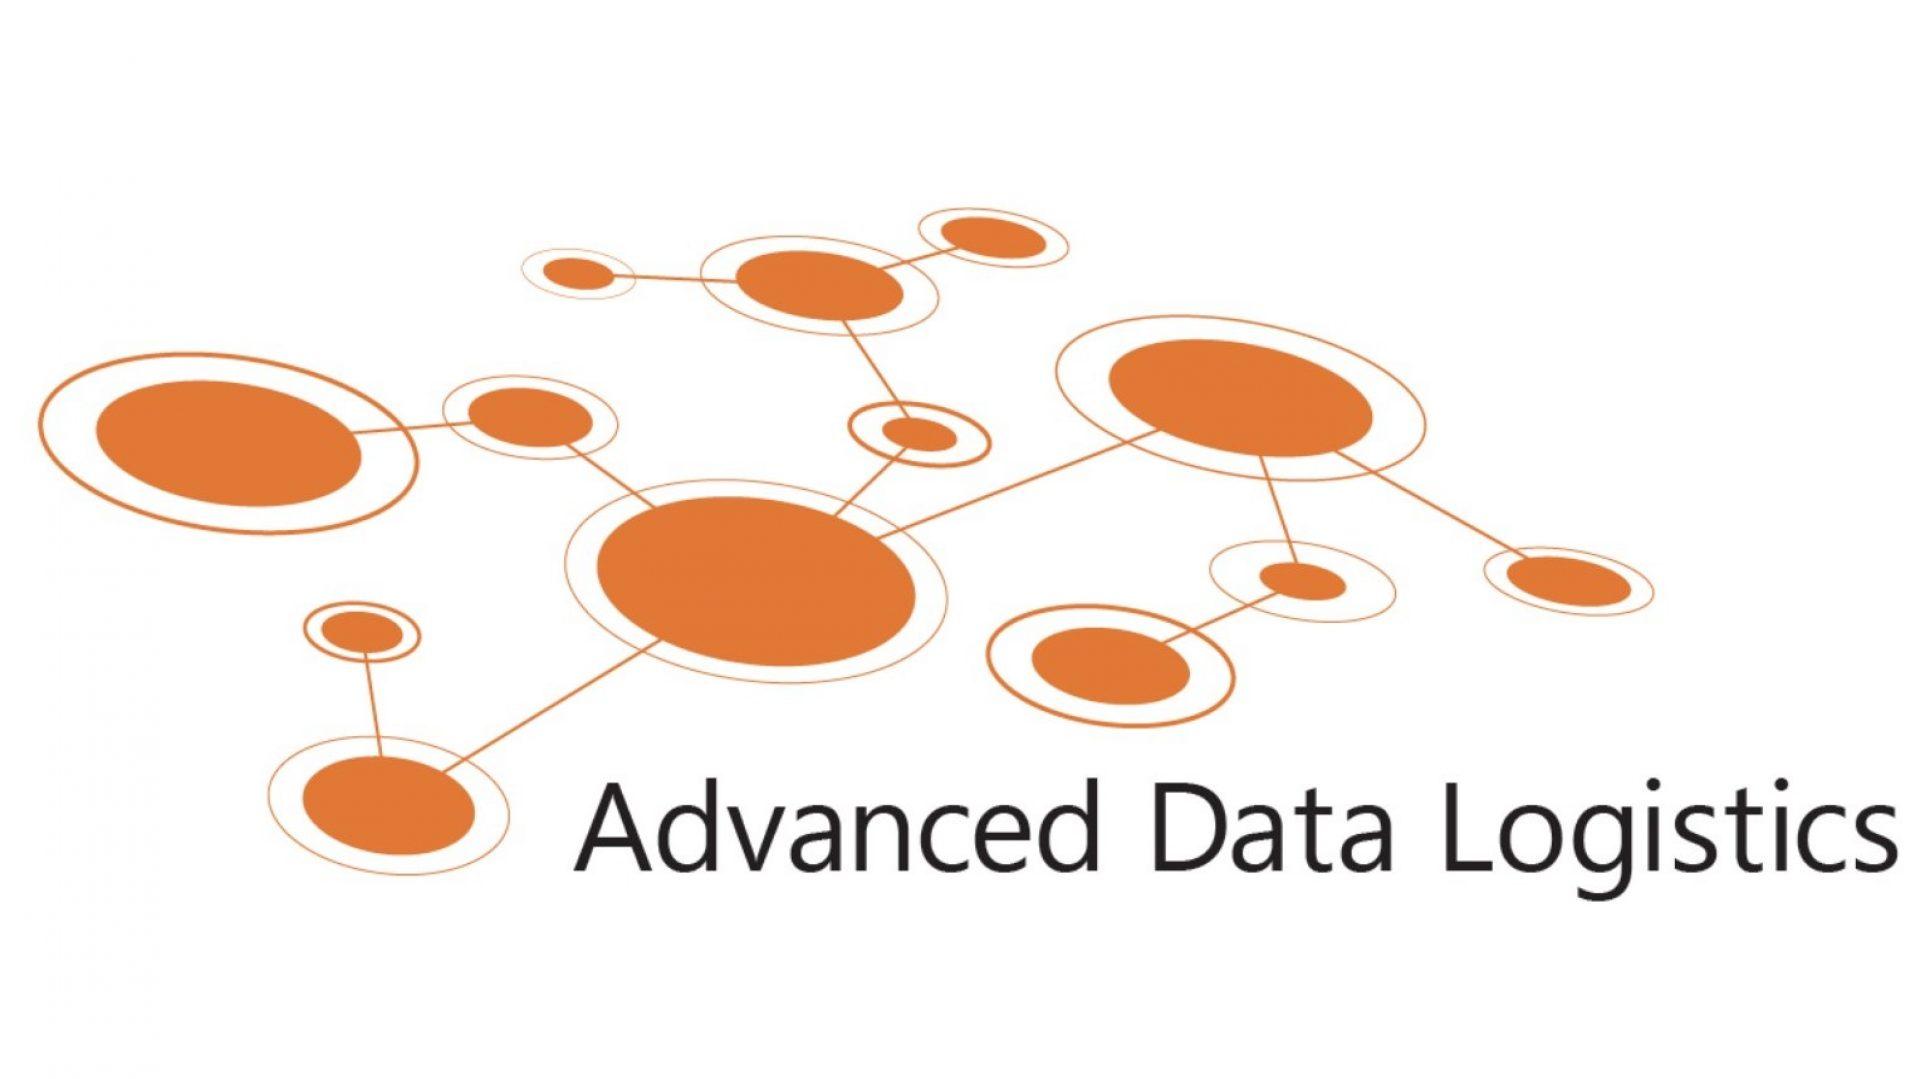 Advanced Data Logistics